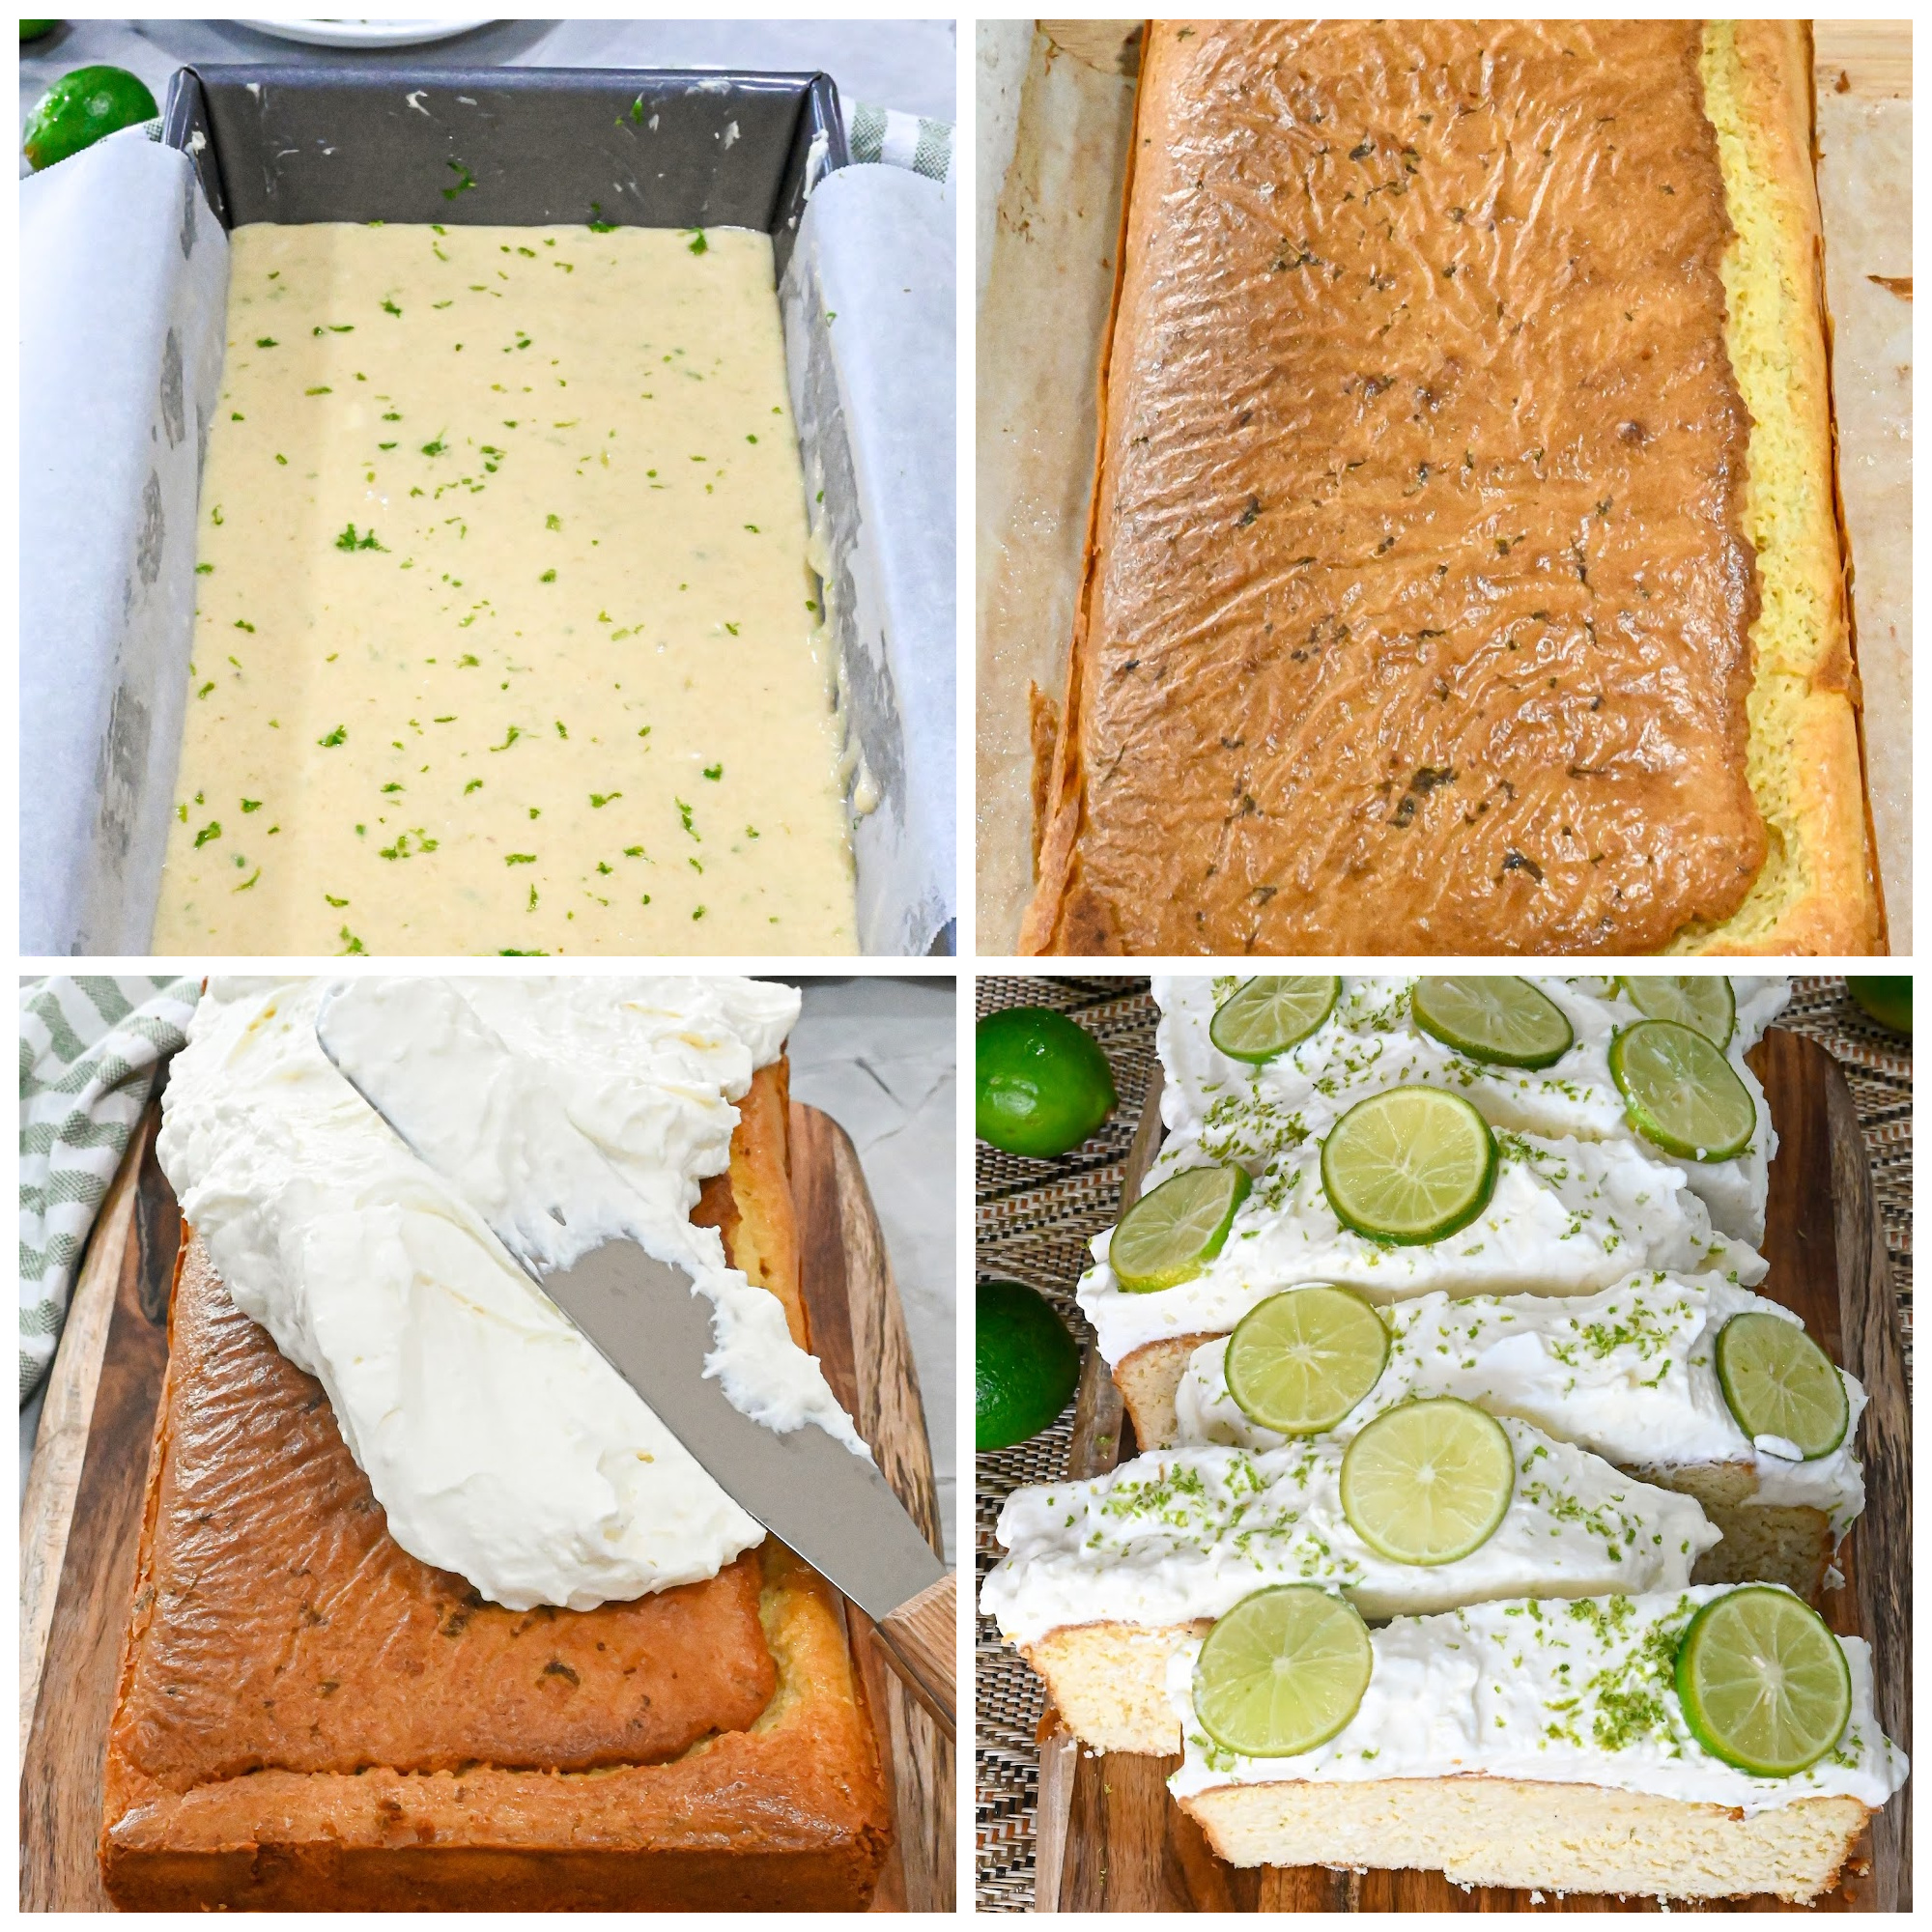 keto key lime pound cake process pictures